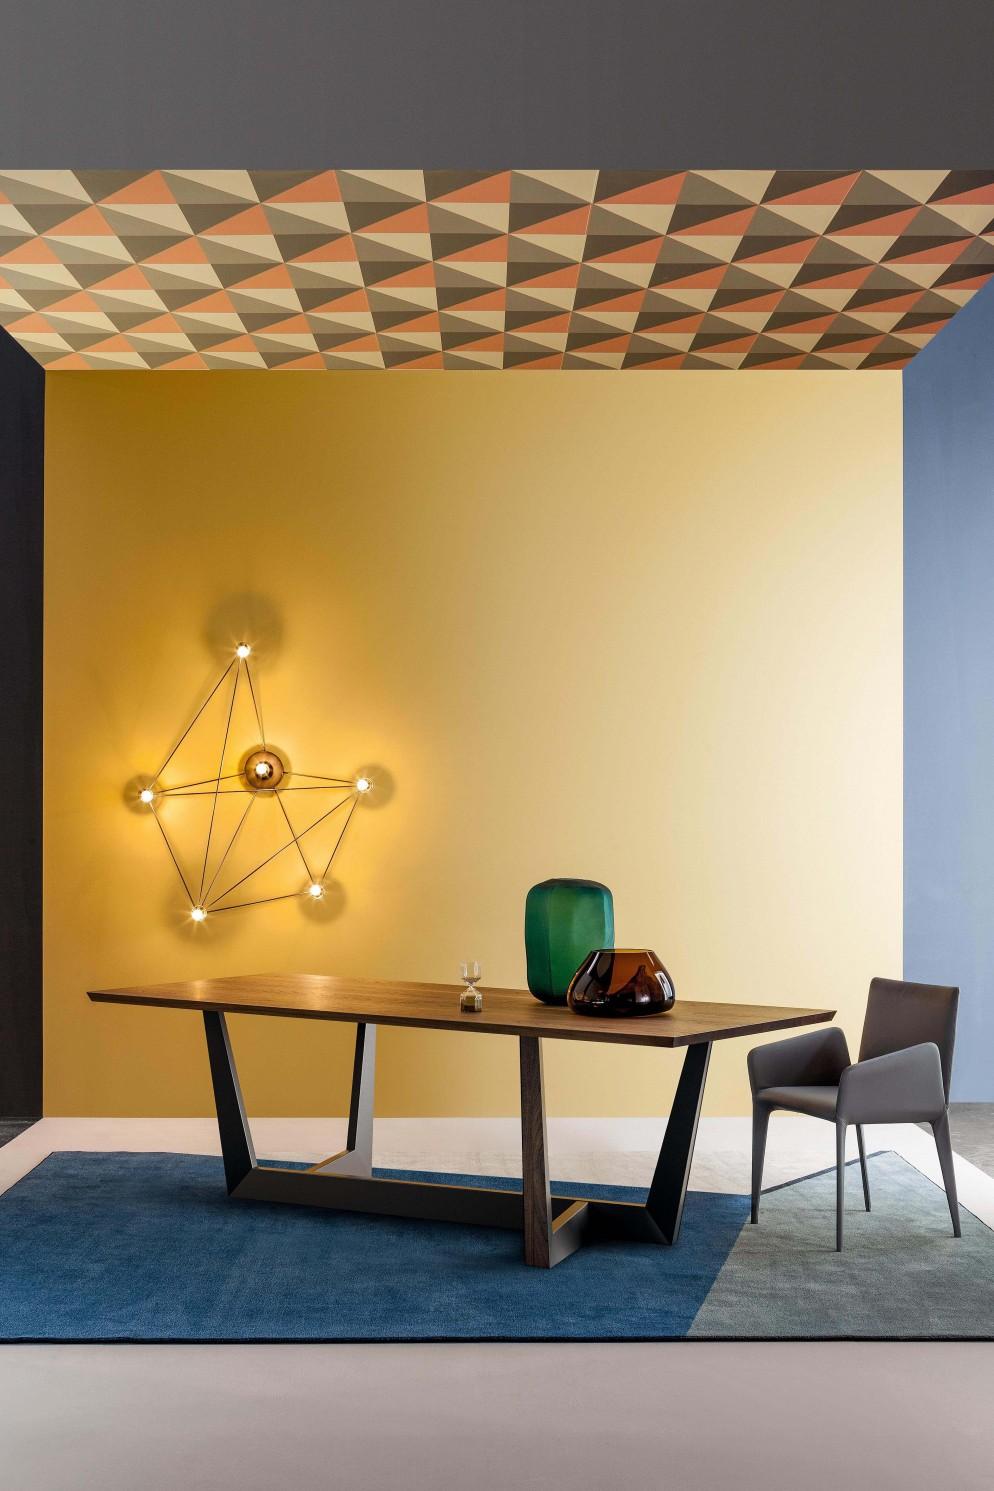 Tavoli e sedie 2019 Foto 1 LivingCorriere